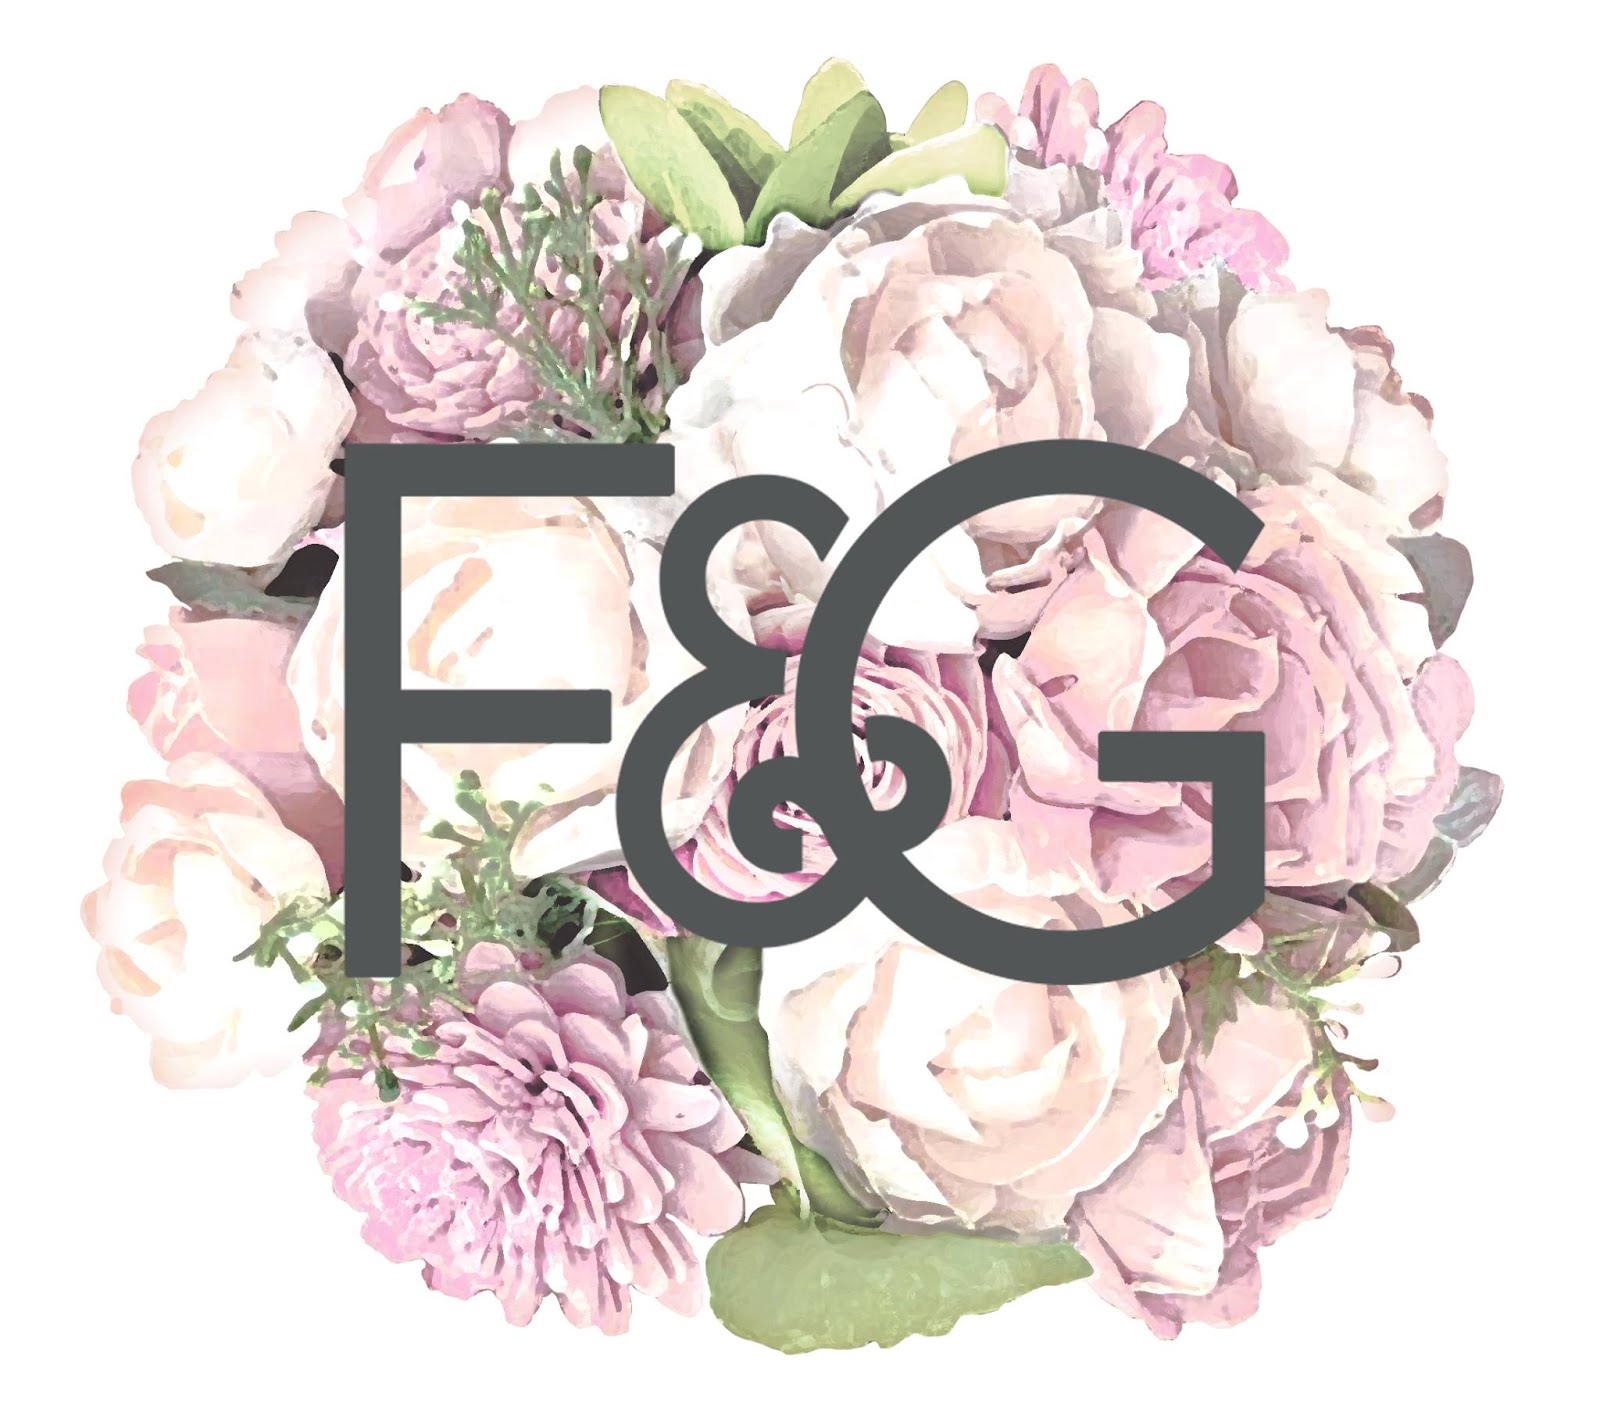 FLOWERS & GREENS